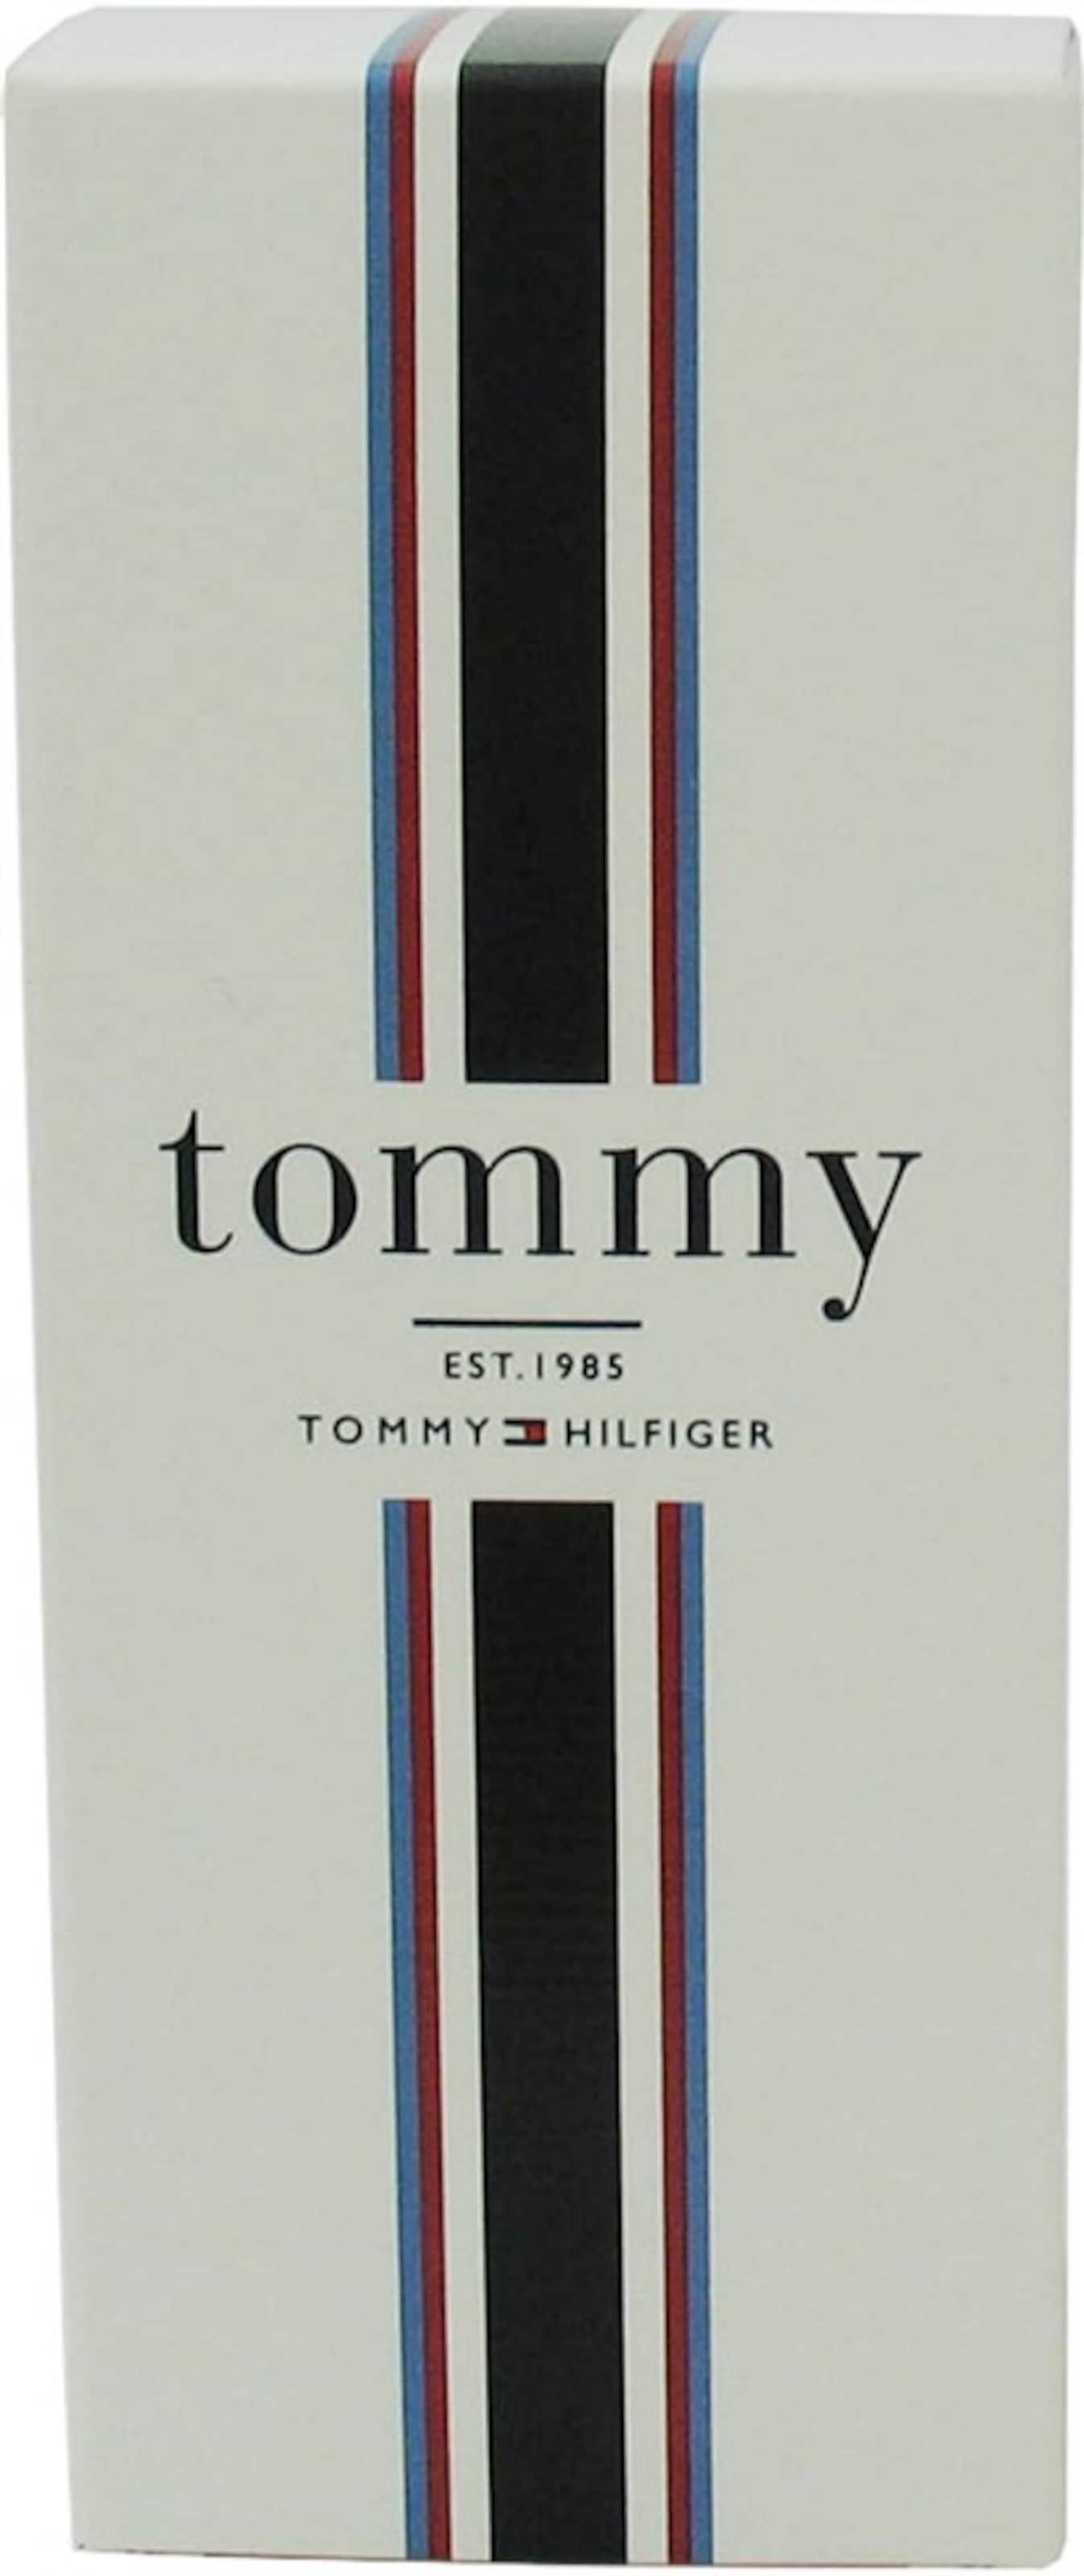 TOMMY HILFIGER 'Tommy Boy' Eau de Toilette Bester Preiswerter Großhandelspreis Rabatt Footlocker Steckdose Neue Stile Billig Verkauf Online-Shopping Liefern HkJWvX